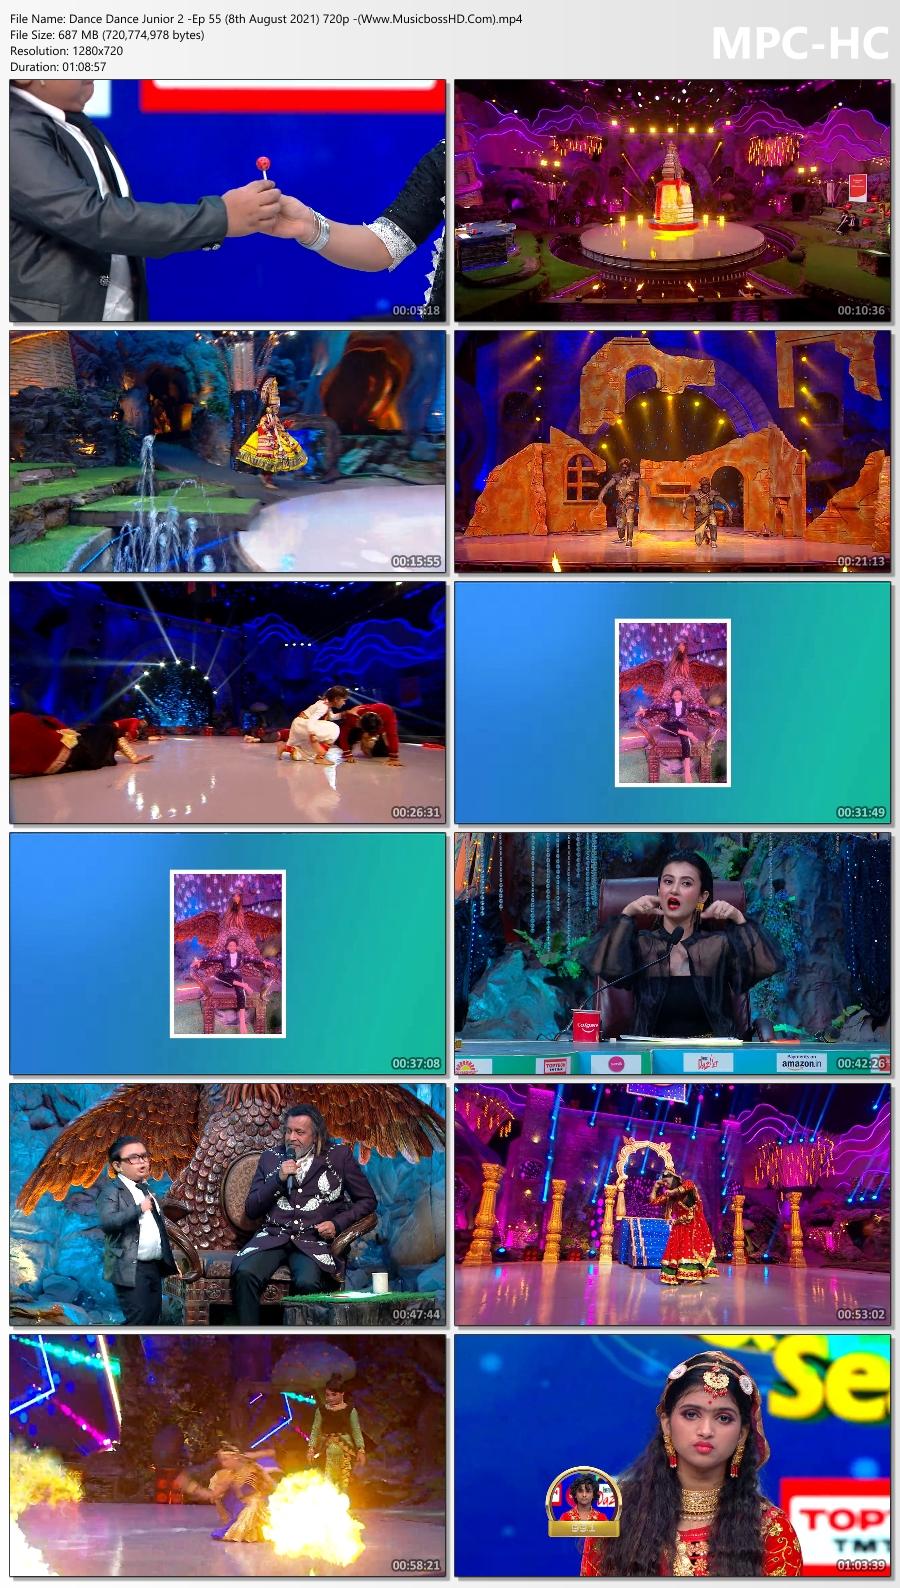 Dance-Dance-Junior-2-Ep-55-8th-August-2021-720p-Www-Musicboss-HD-Com-mp4-thumbs